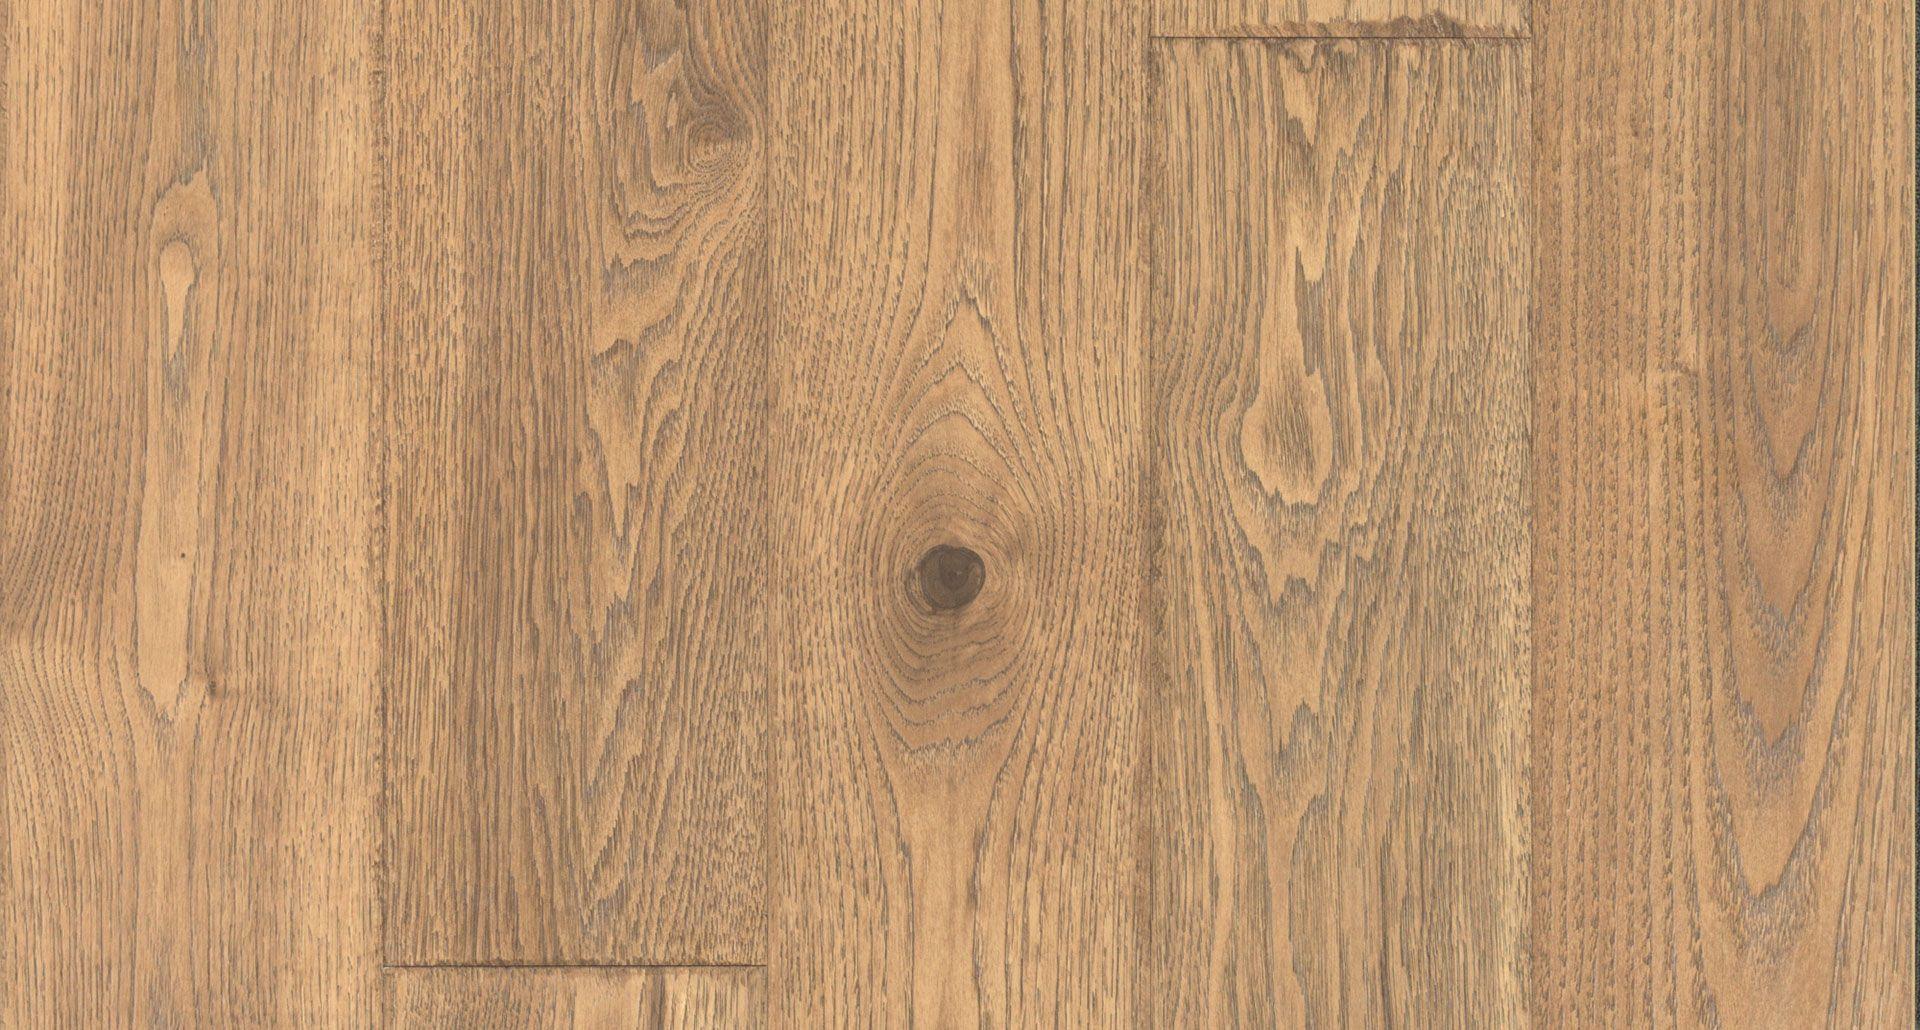 does lowes install hardwood floors of brier creek oak pergoa timbercraft wetprotect laminate flooring 2 99 in brier creek oak pergoa timbercraft wetprotect laminate flooring 2 99 sqft at lowes